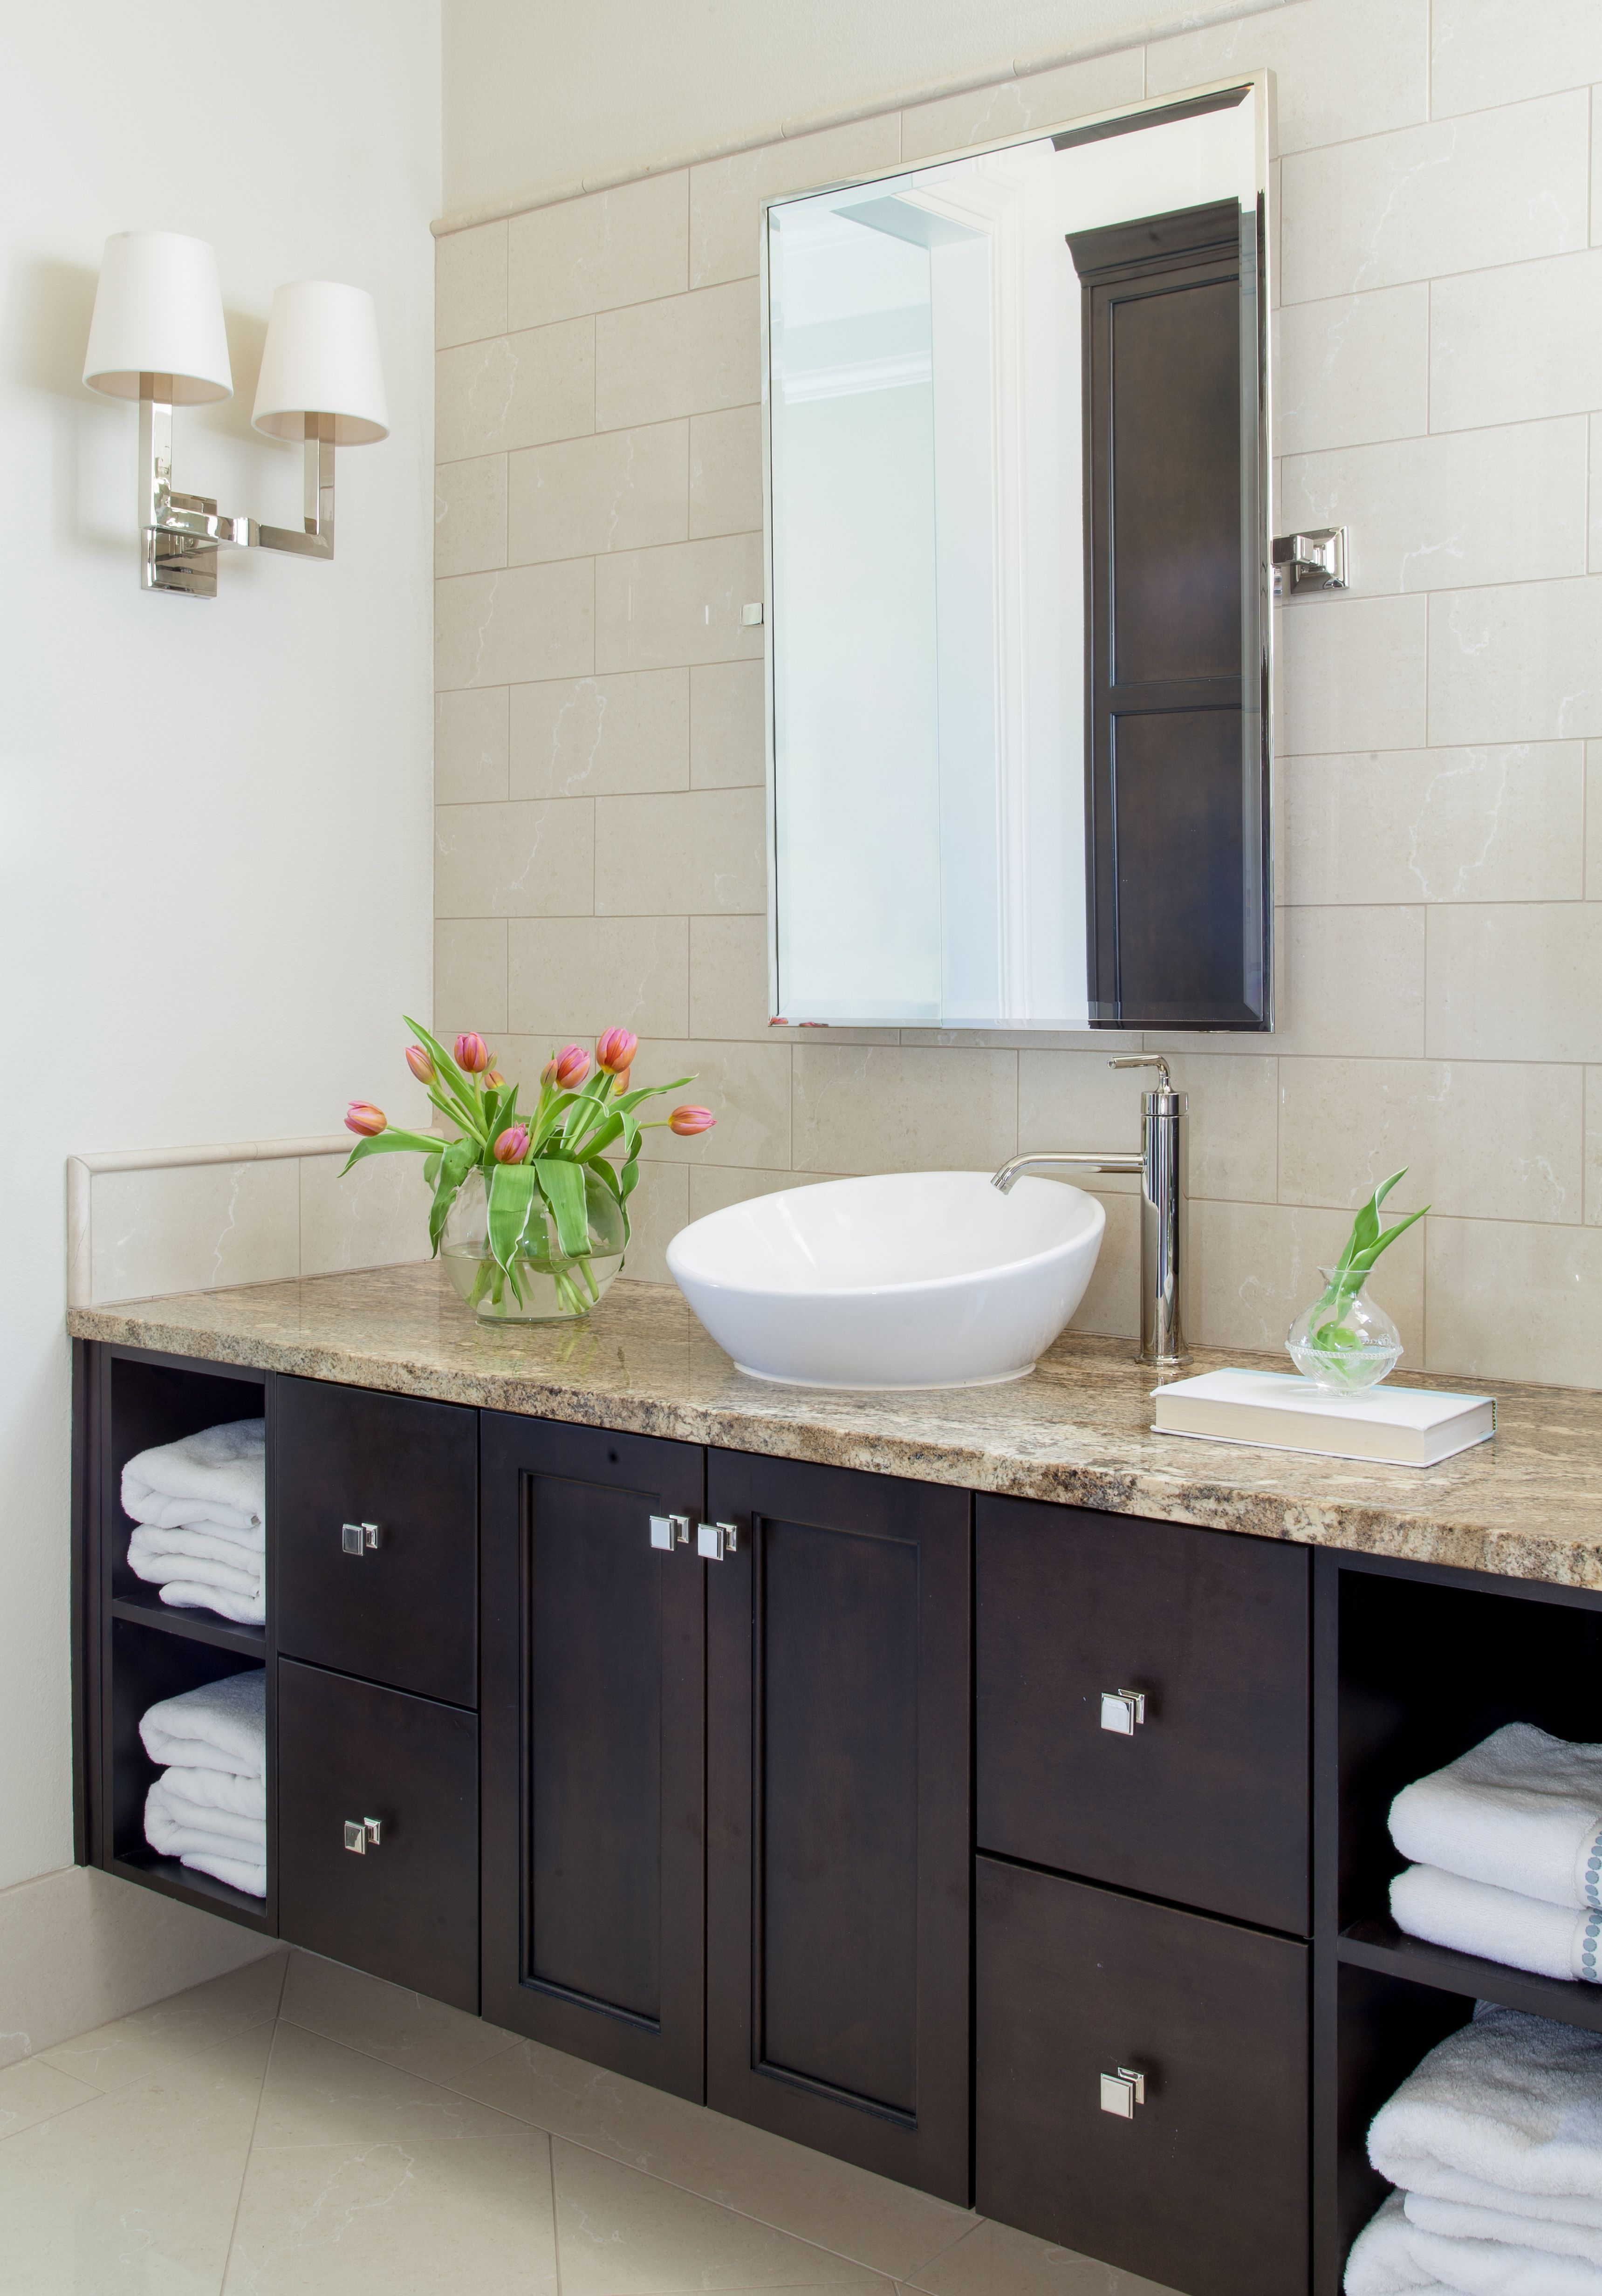 Elegant Bathroom Dark Cabinets Crema Marfil Marble Tiles Vessel Sinks Square